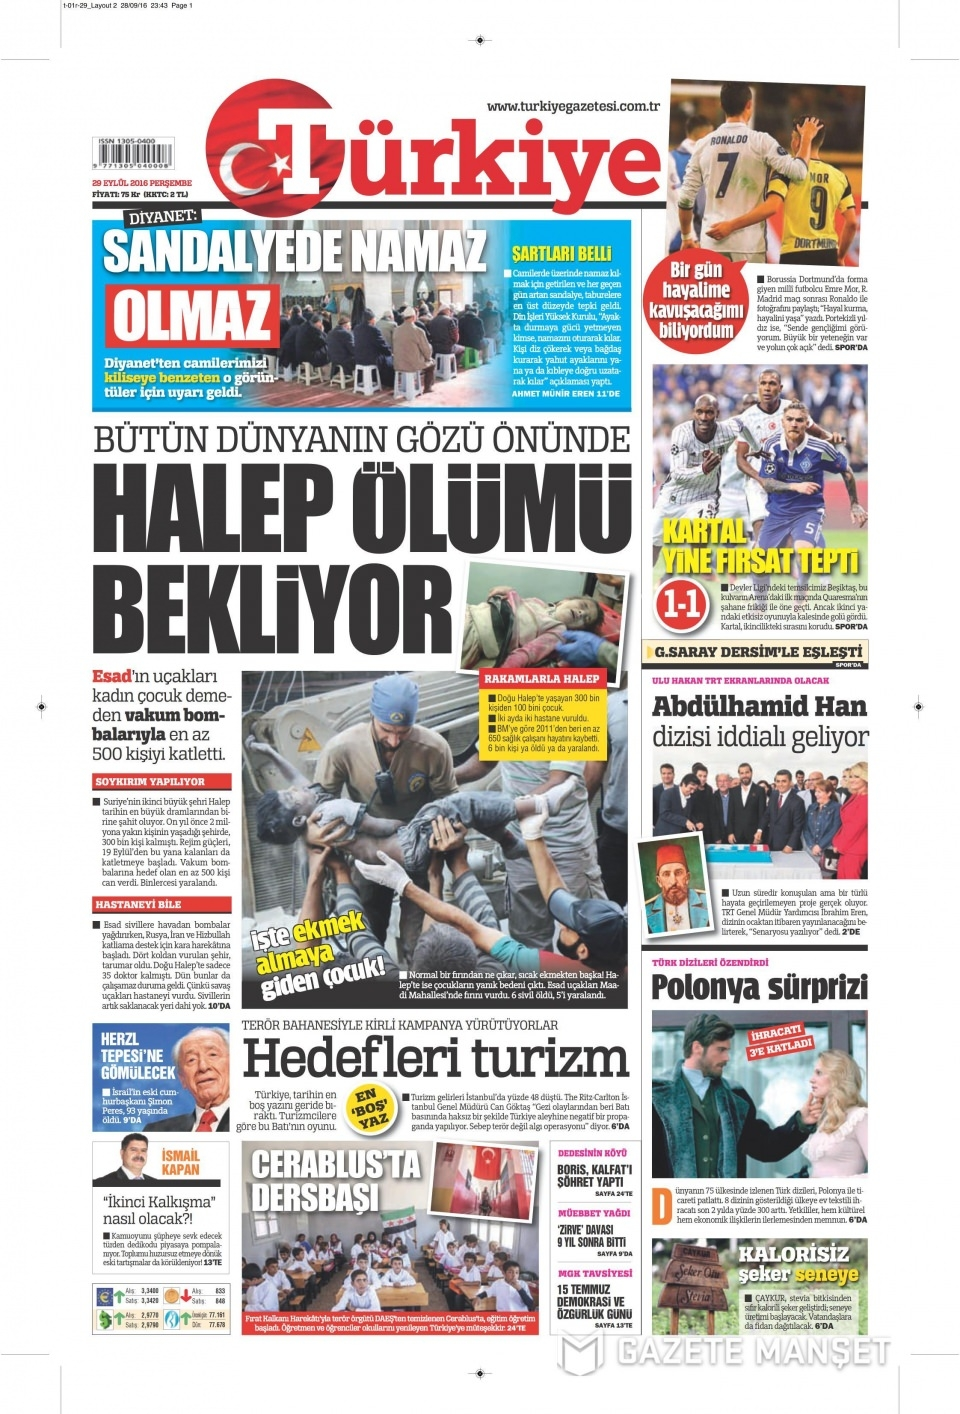 29 Eylül Perşembe gazete manşetleri 6